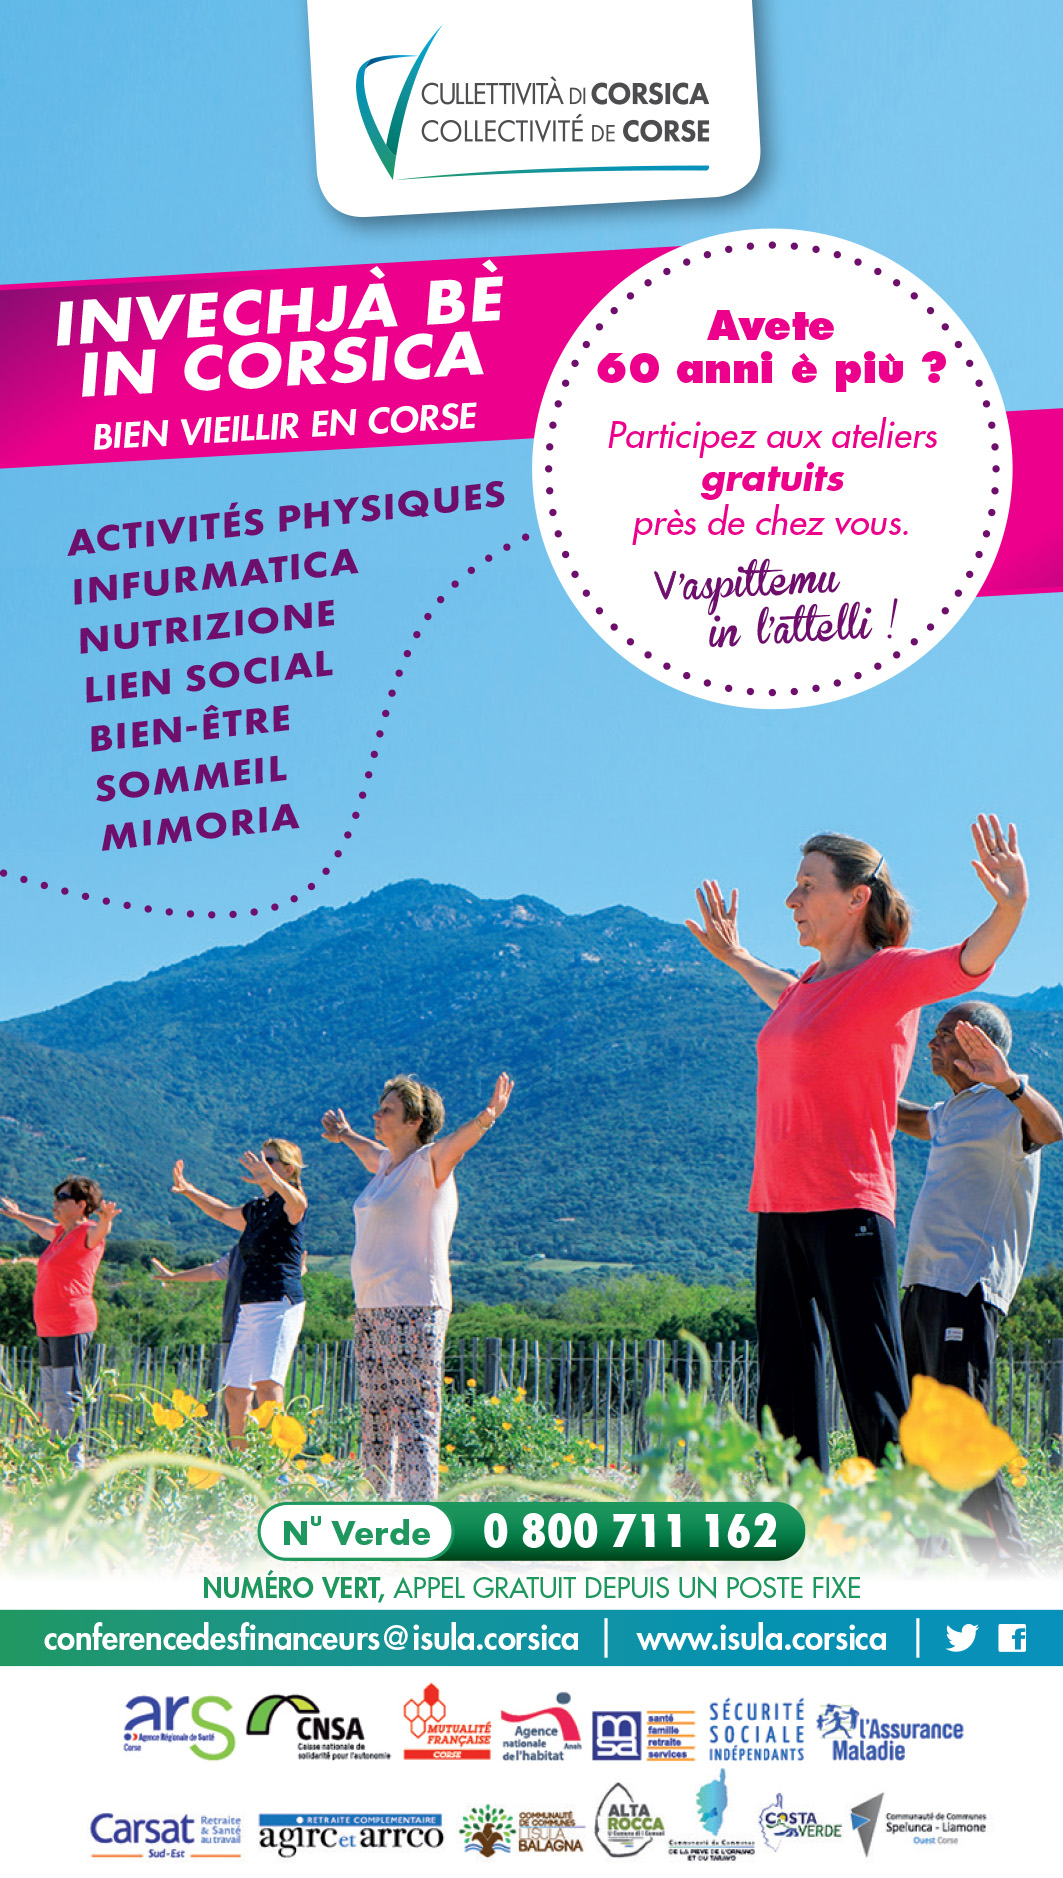 Invechjà bè in Corsica - Bien vieillir en Corse